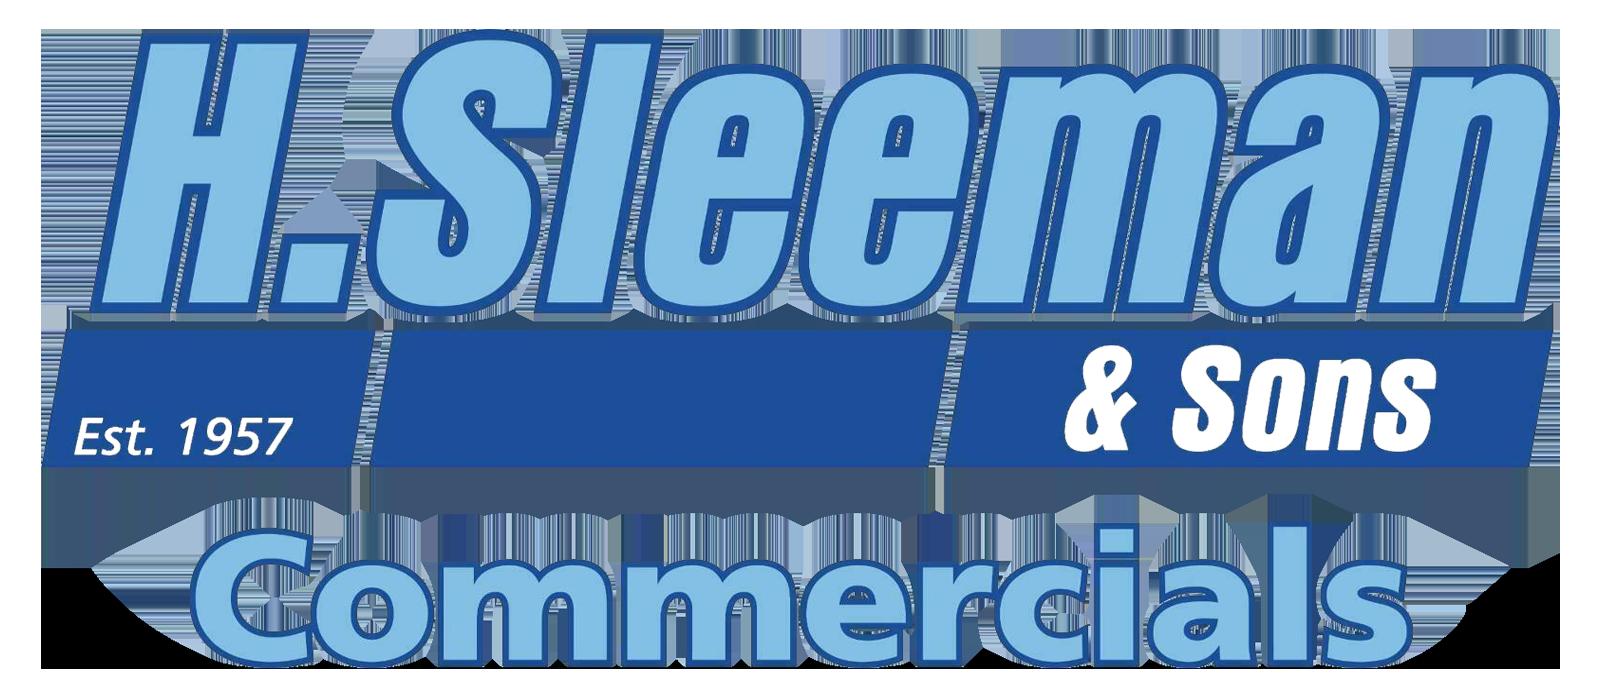 H. Sleeman & Sons